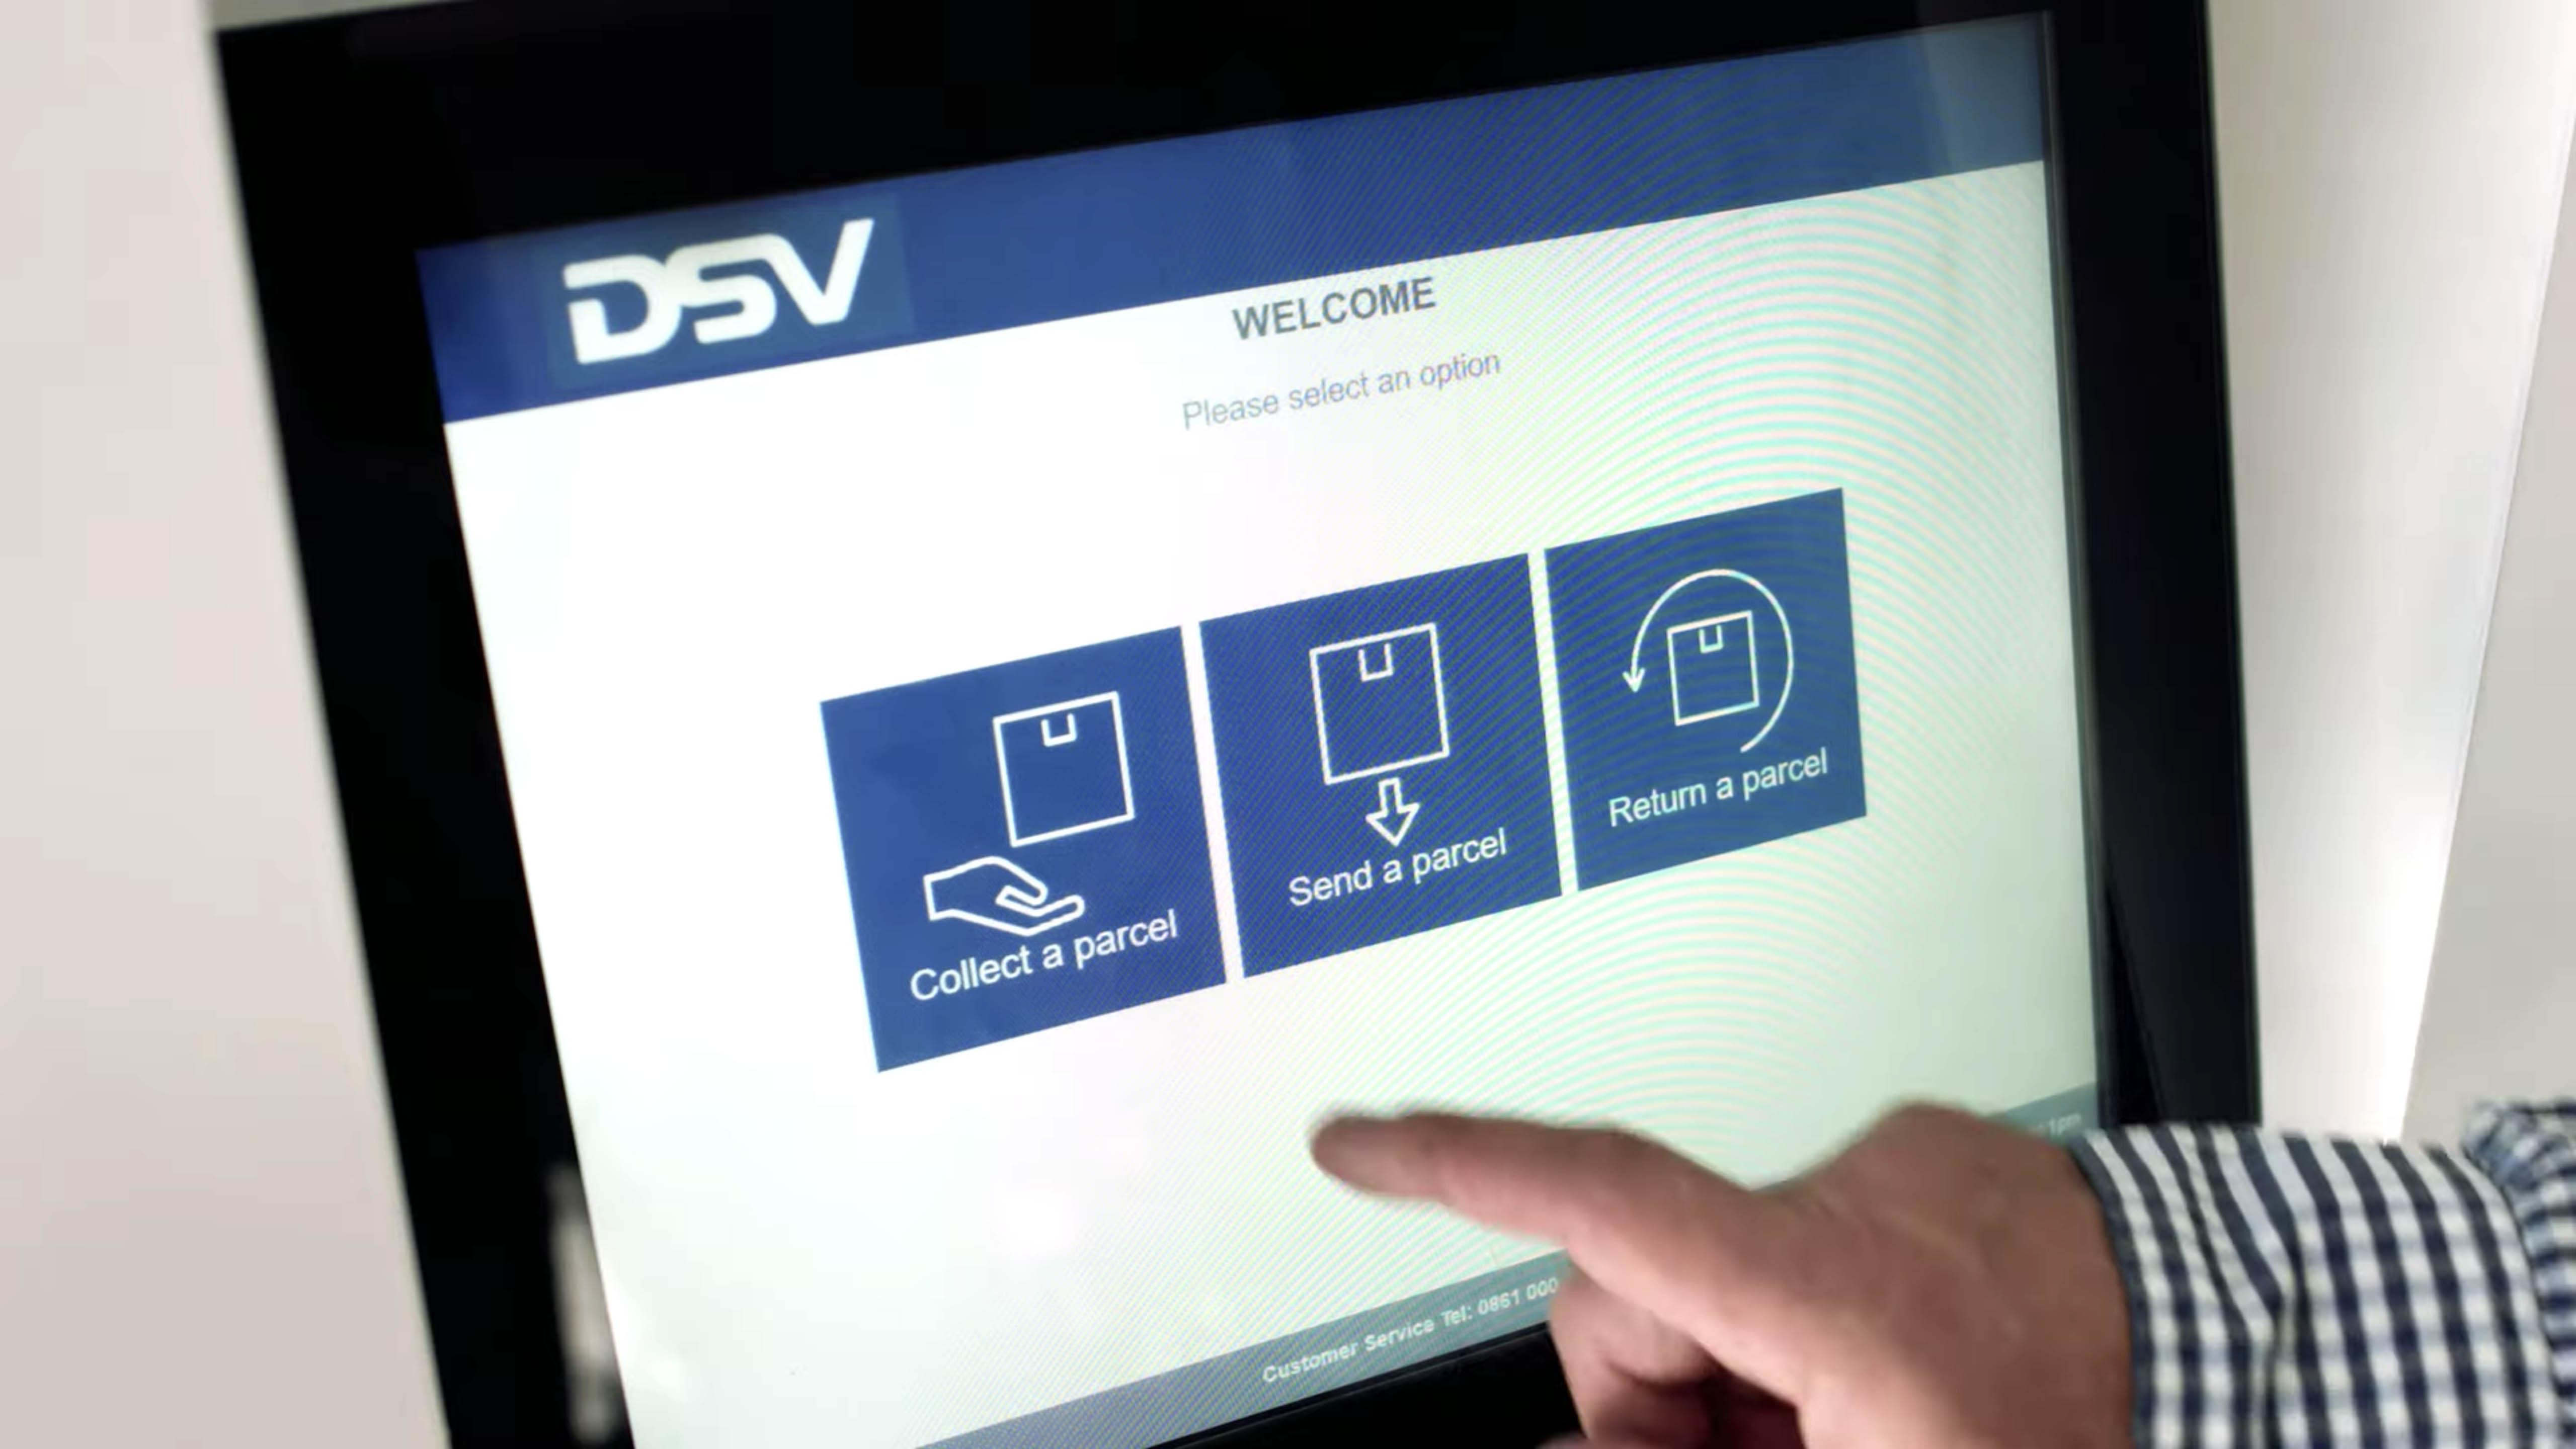 DSV_Screen